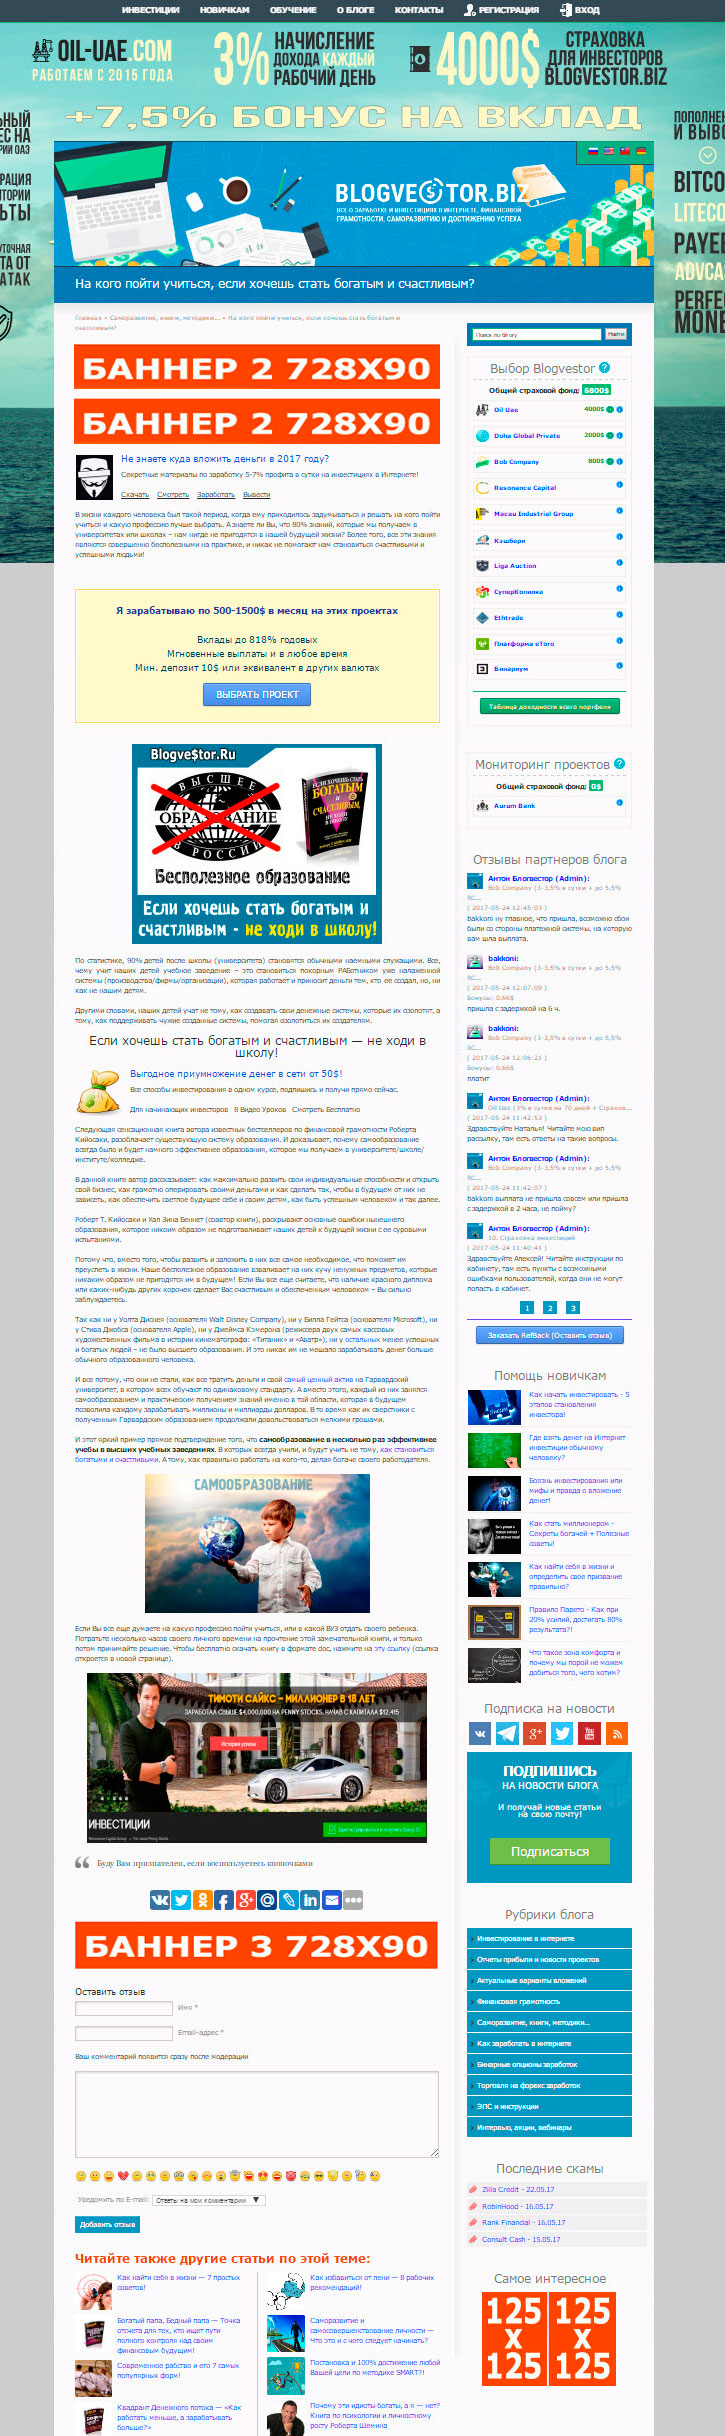 reklama-bg-primer-nachalo-konec-sajdbar-new